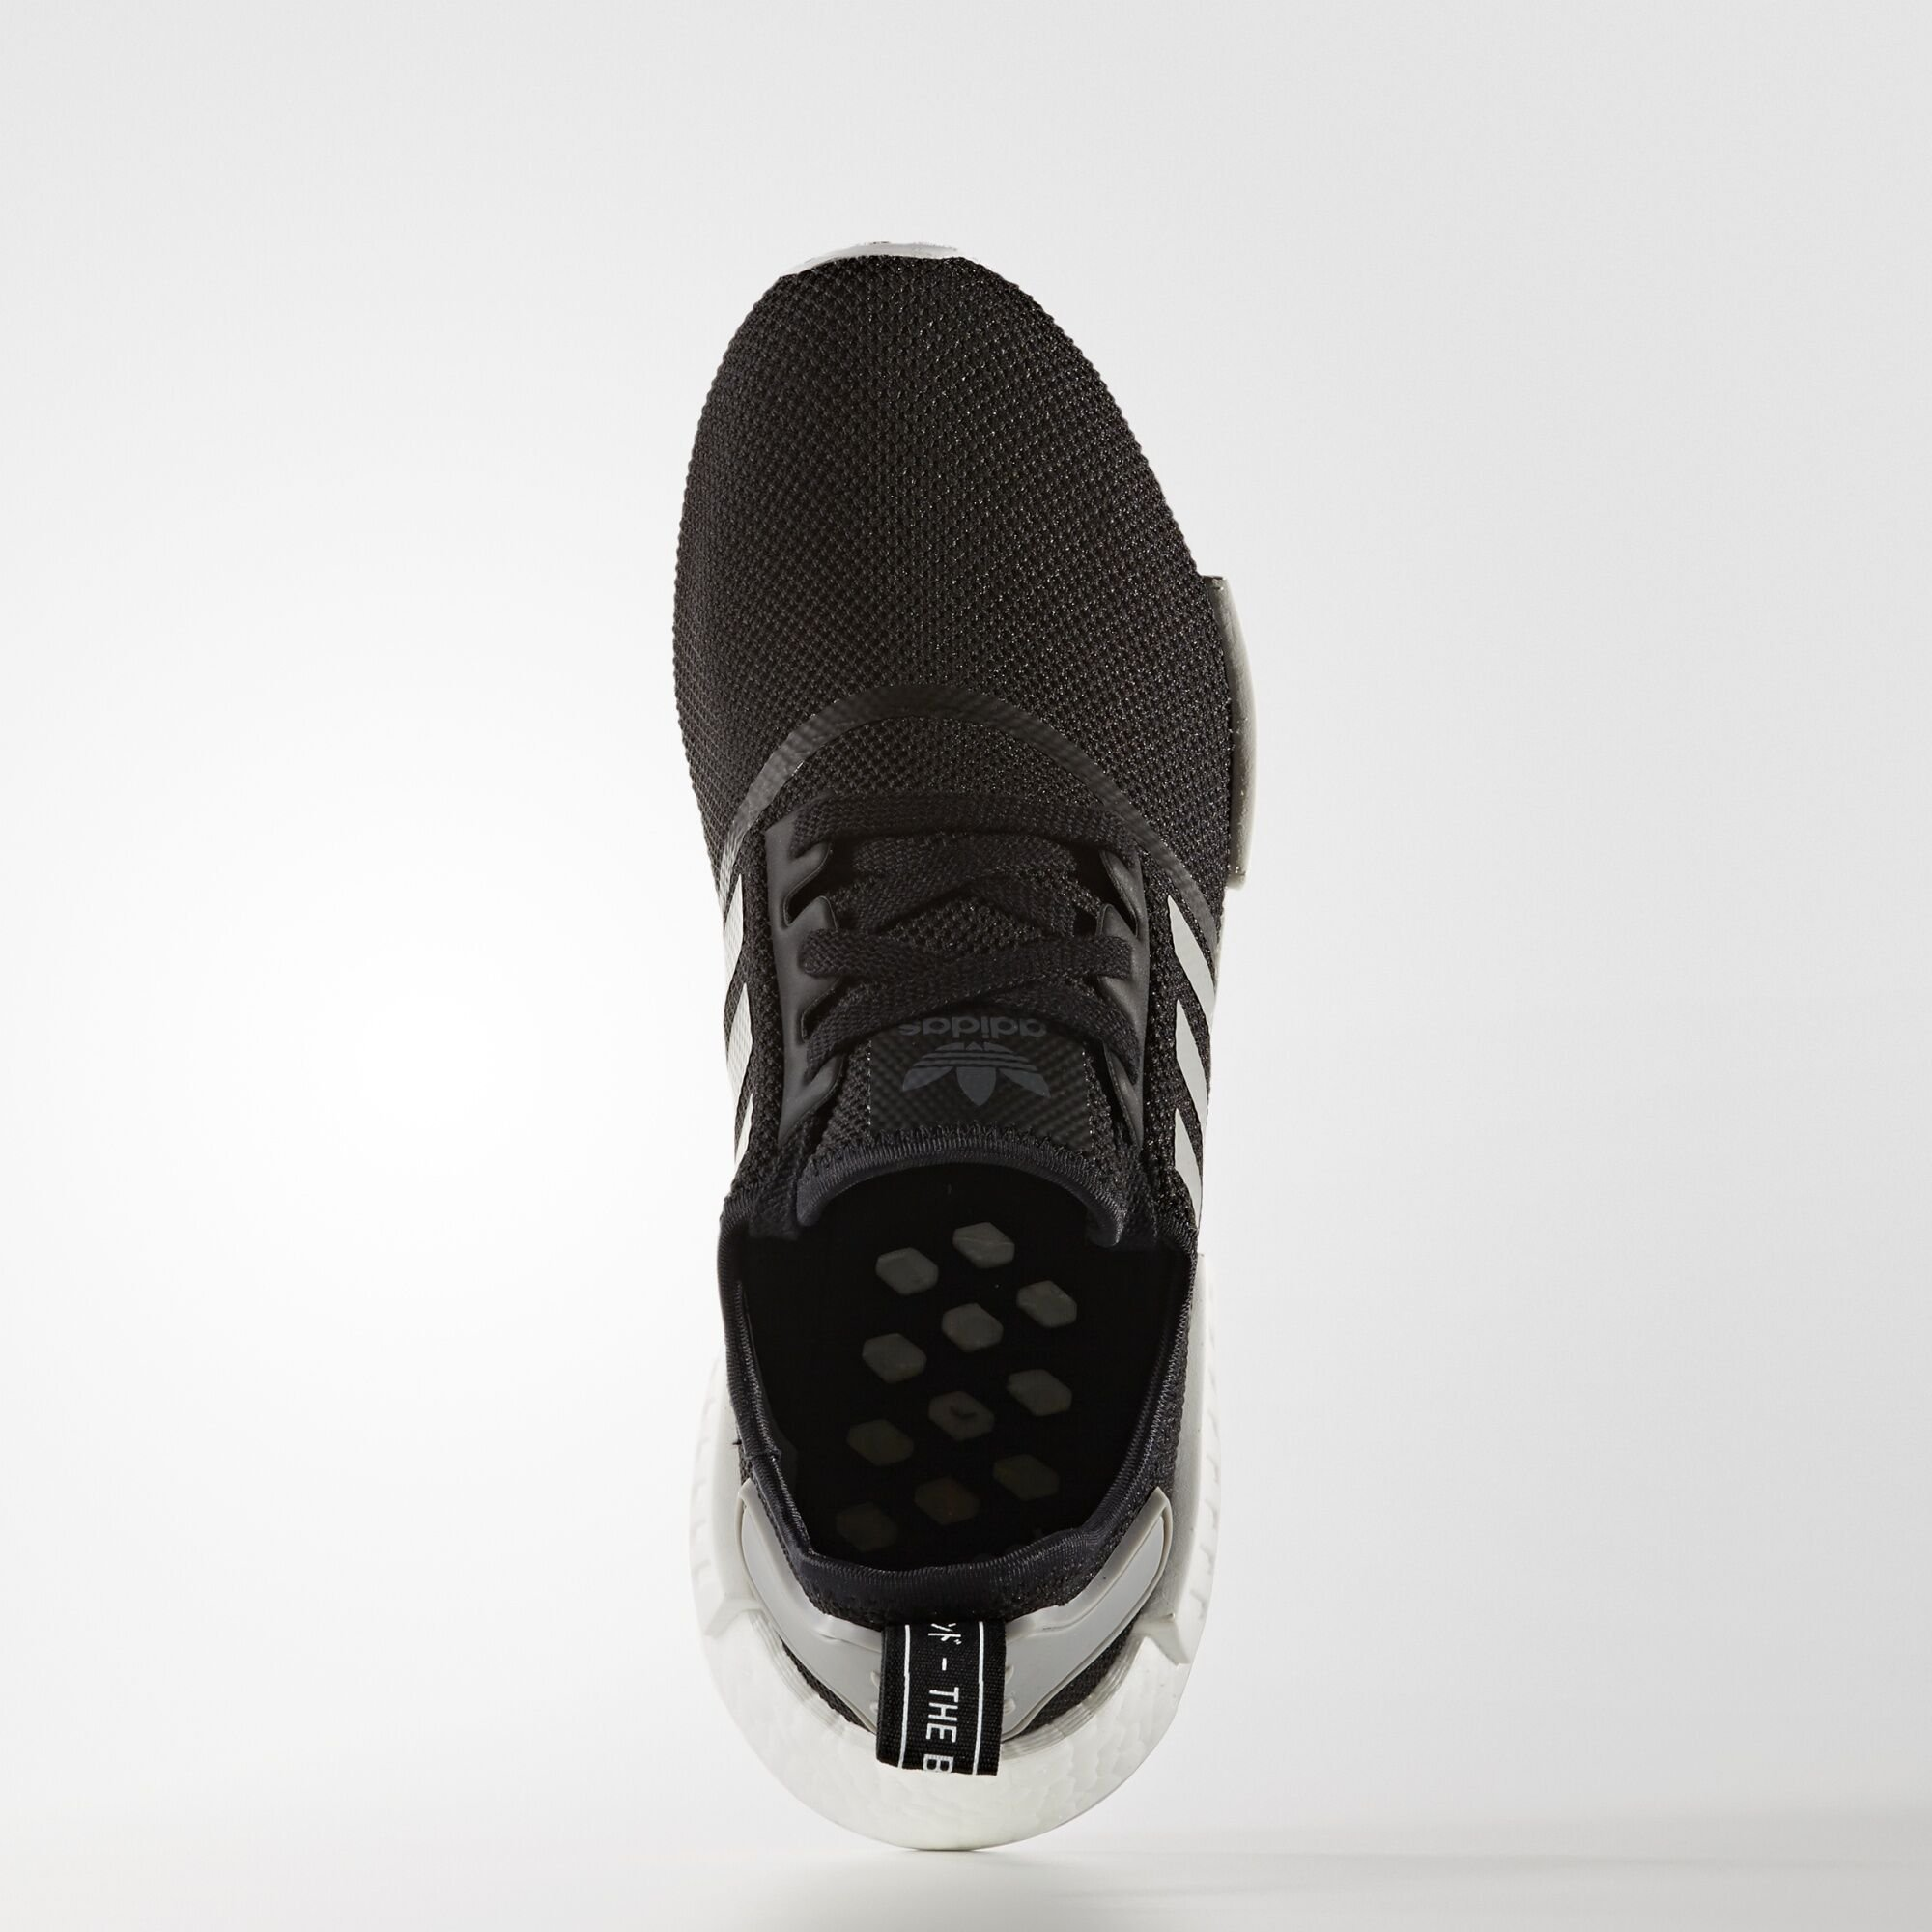 adidas  NMD R1 Black Charcoal (S31504)